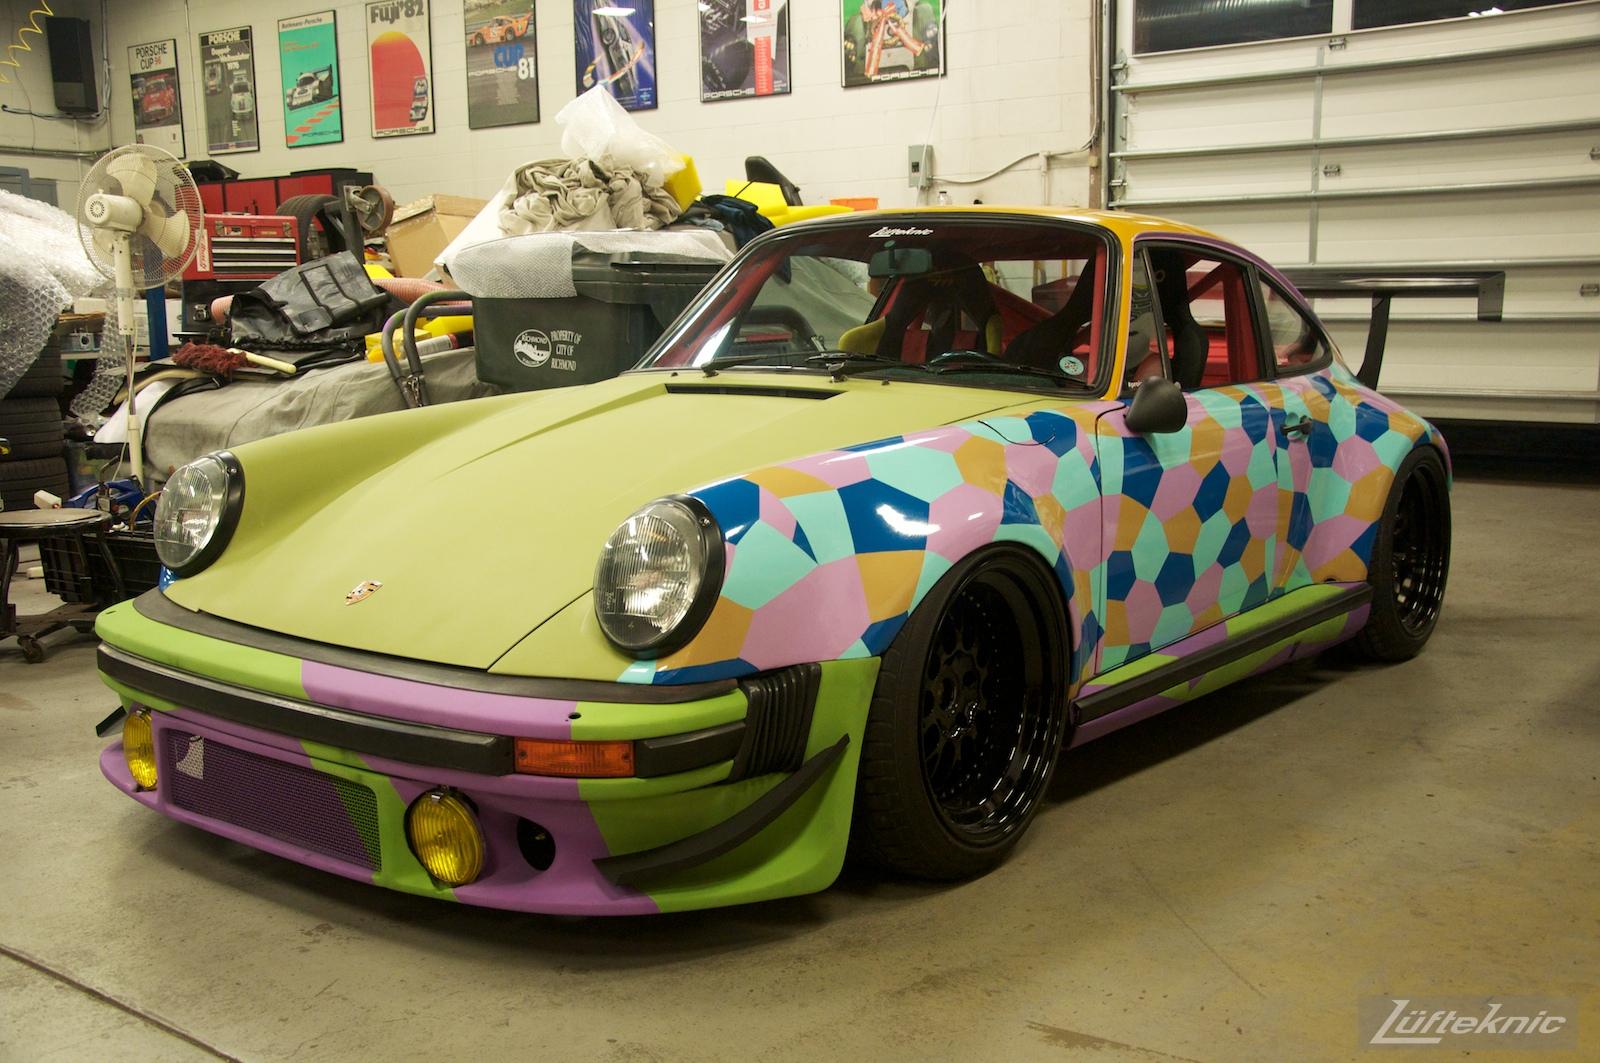 Lüfteknic #projectstuka Porsche 930 Turbo is complete, 4:30am.